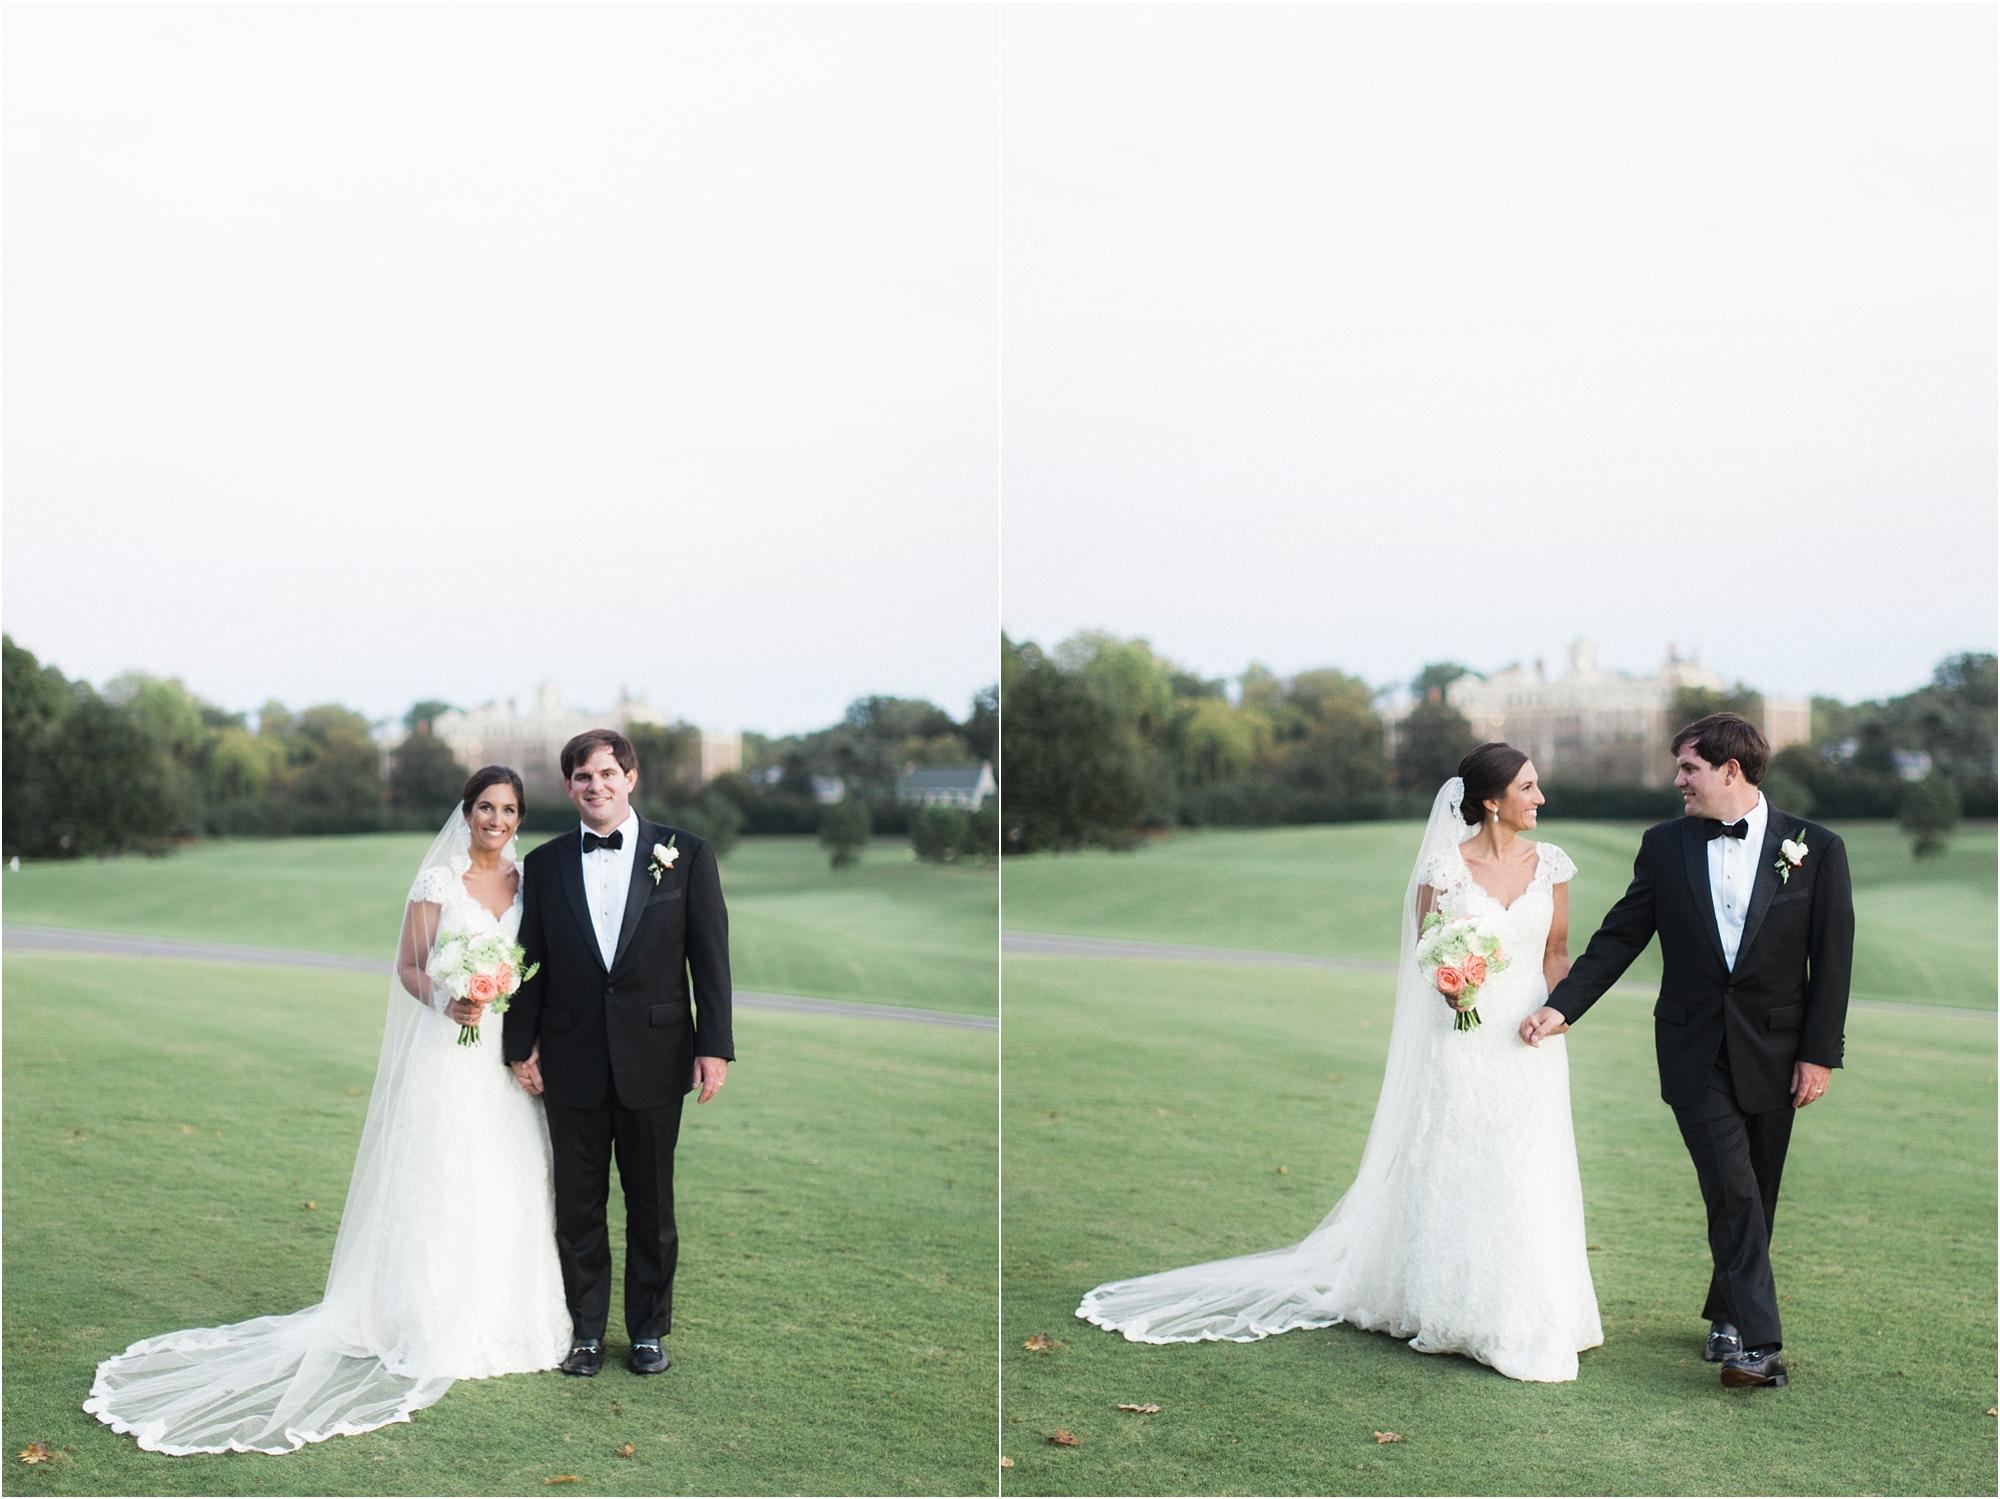 stephanie-yonce-photography-richmond-virginia-country-club-wedding-photo_031.JPG